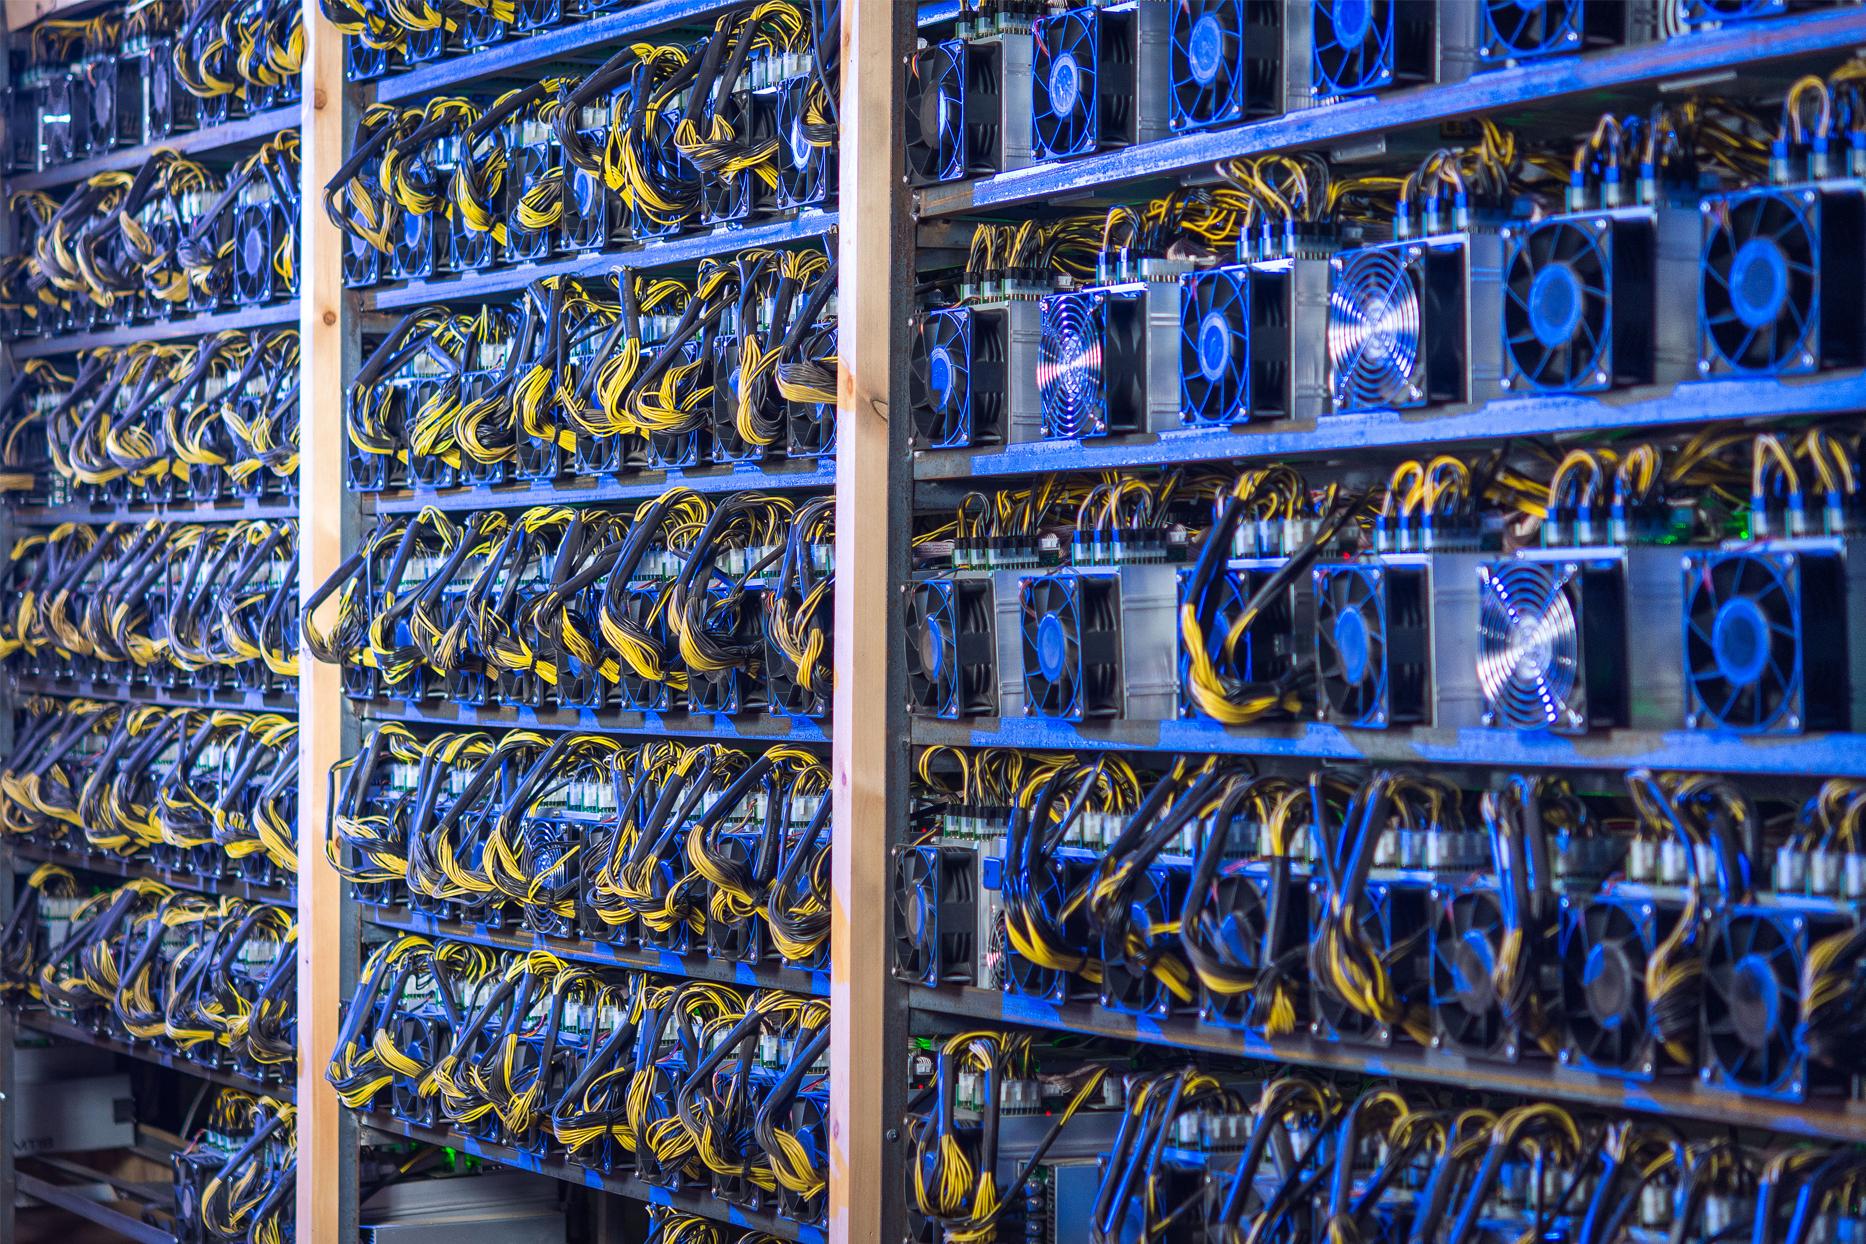 Granjas de minado de criptomonedas